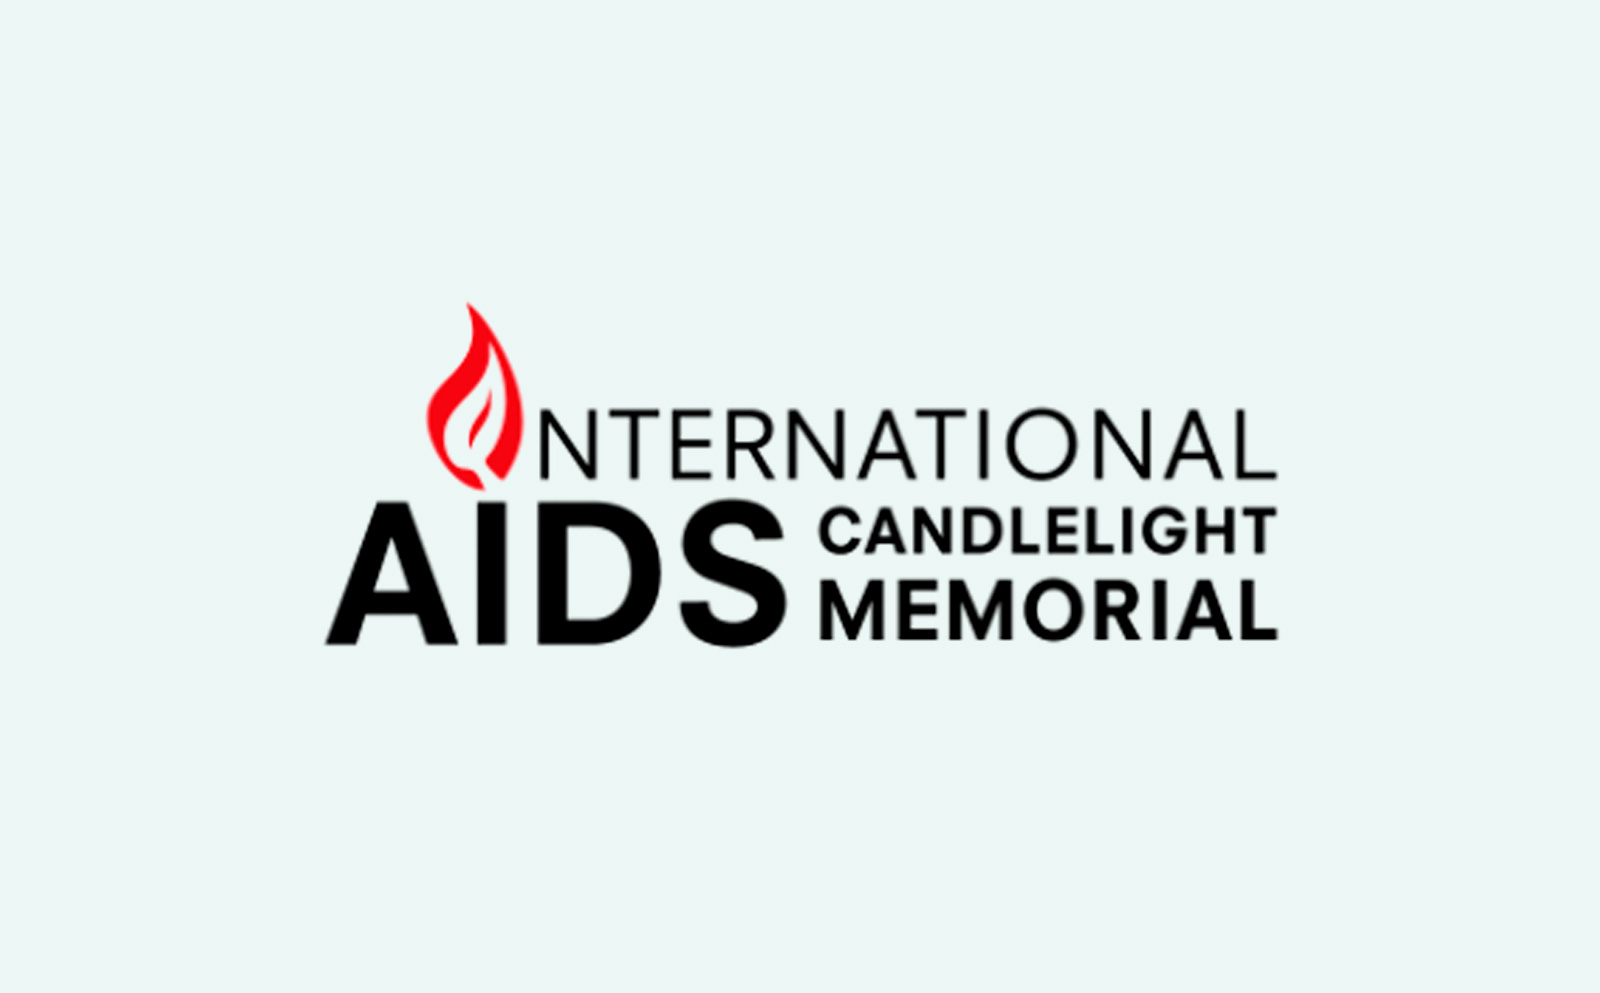 International AIDS Candlelight Memorial logo